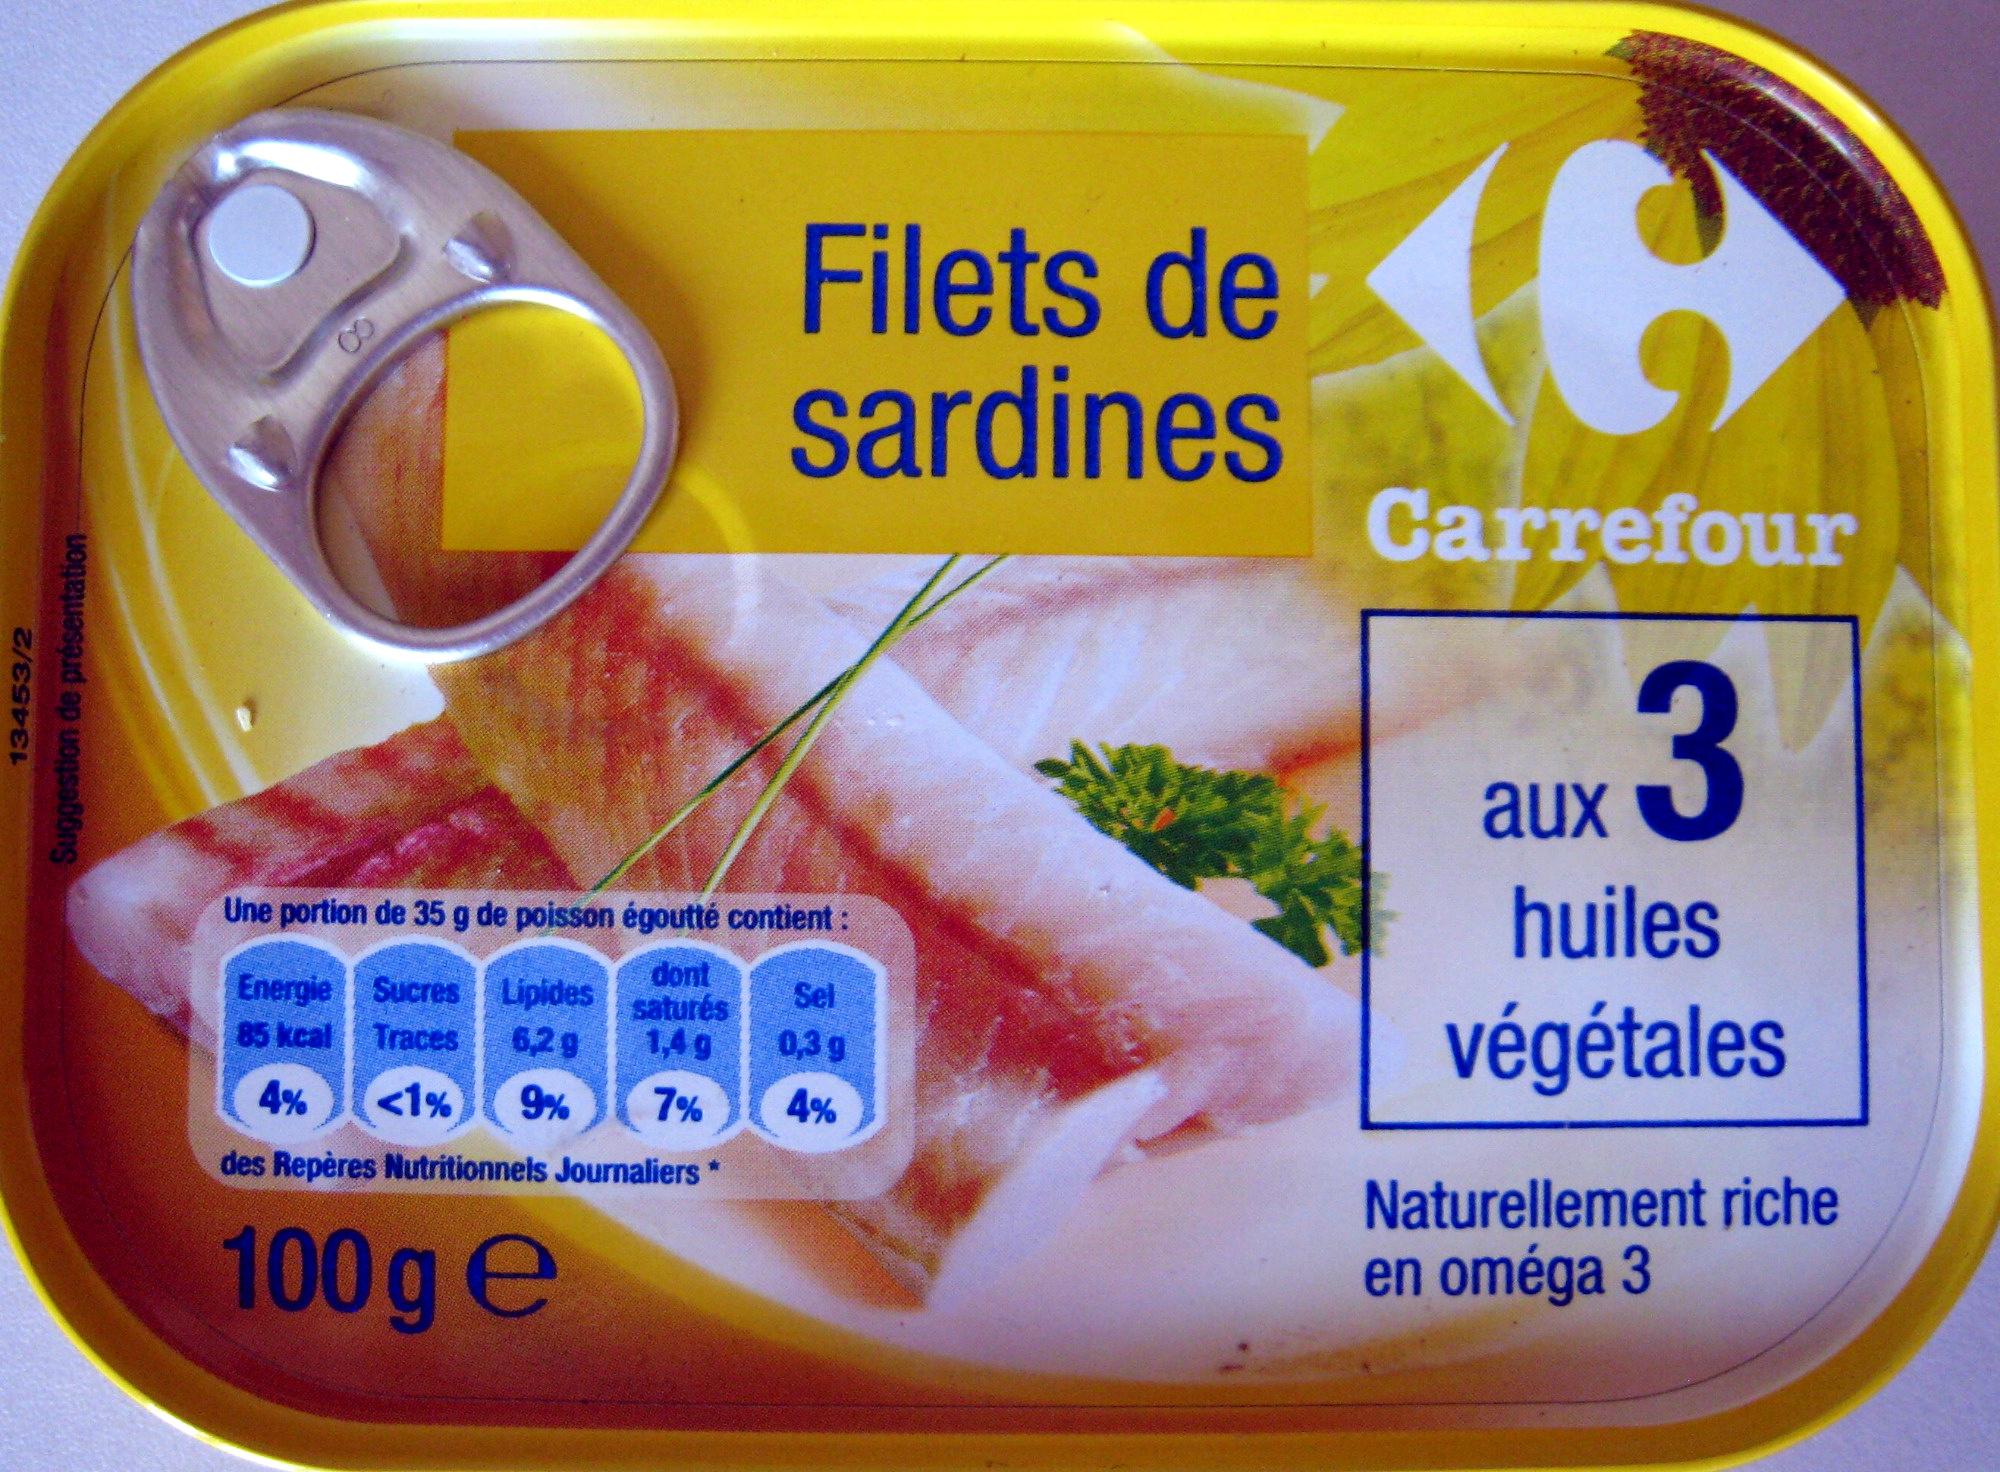 filets de sardines aux 3 huiles v g tales carrefour 100 g. Black Bedroom Furniture Sets. Home Design Ideas